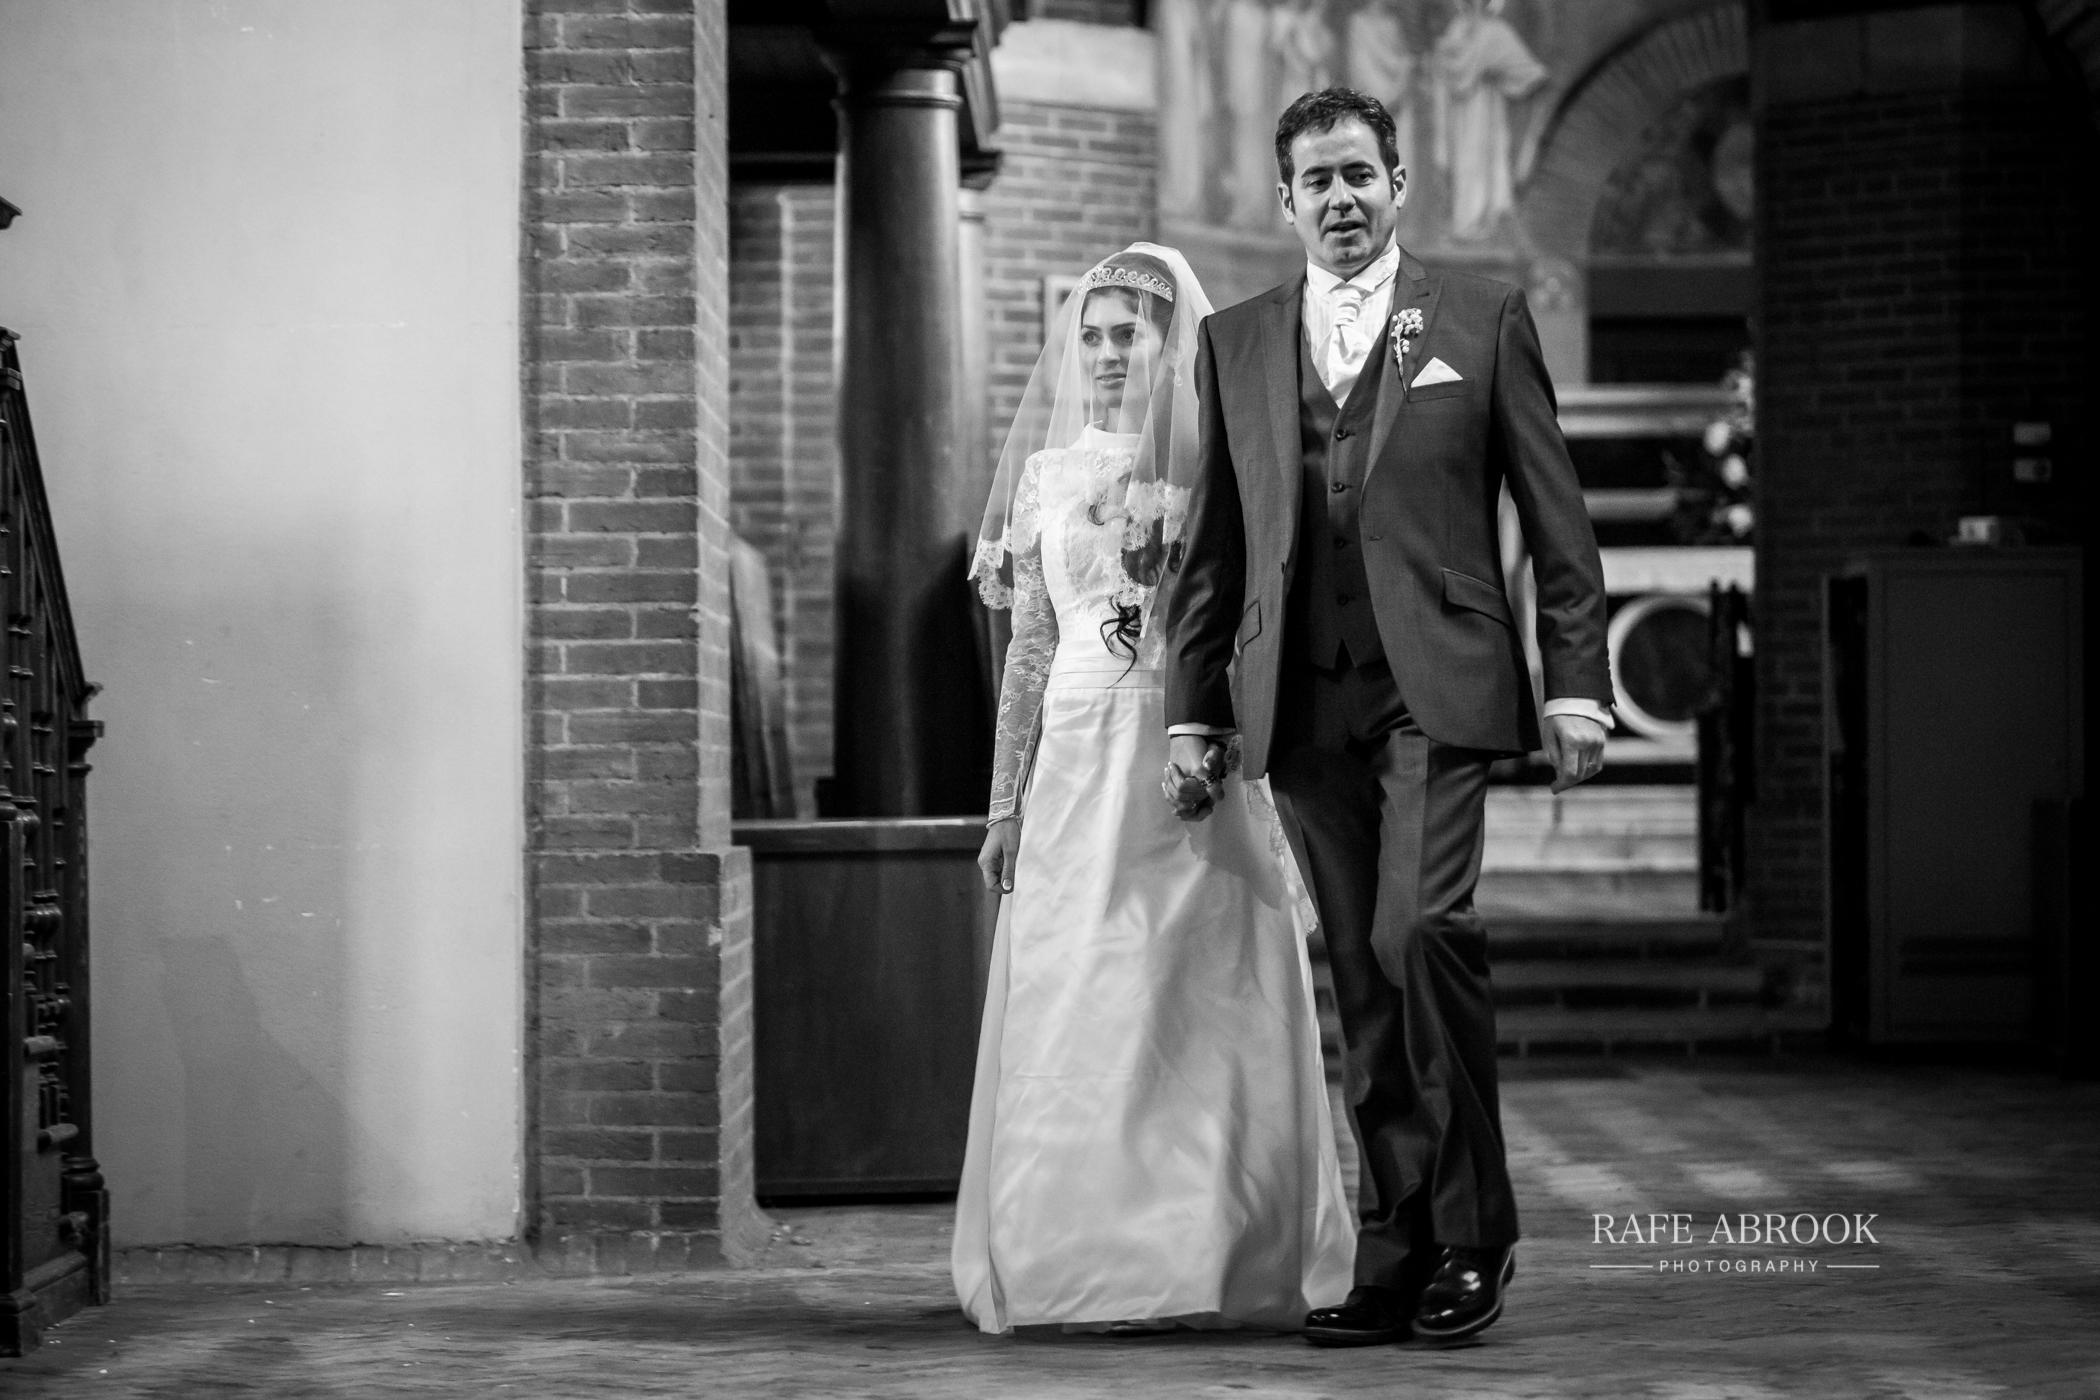 roma & pete wedding hampstead shenley hertfordshire -233.jpg